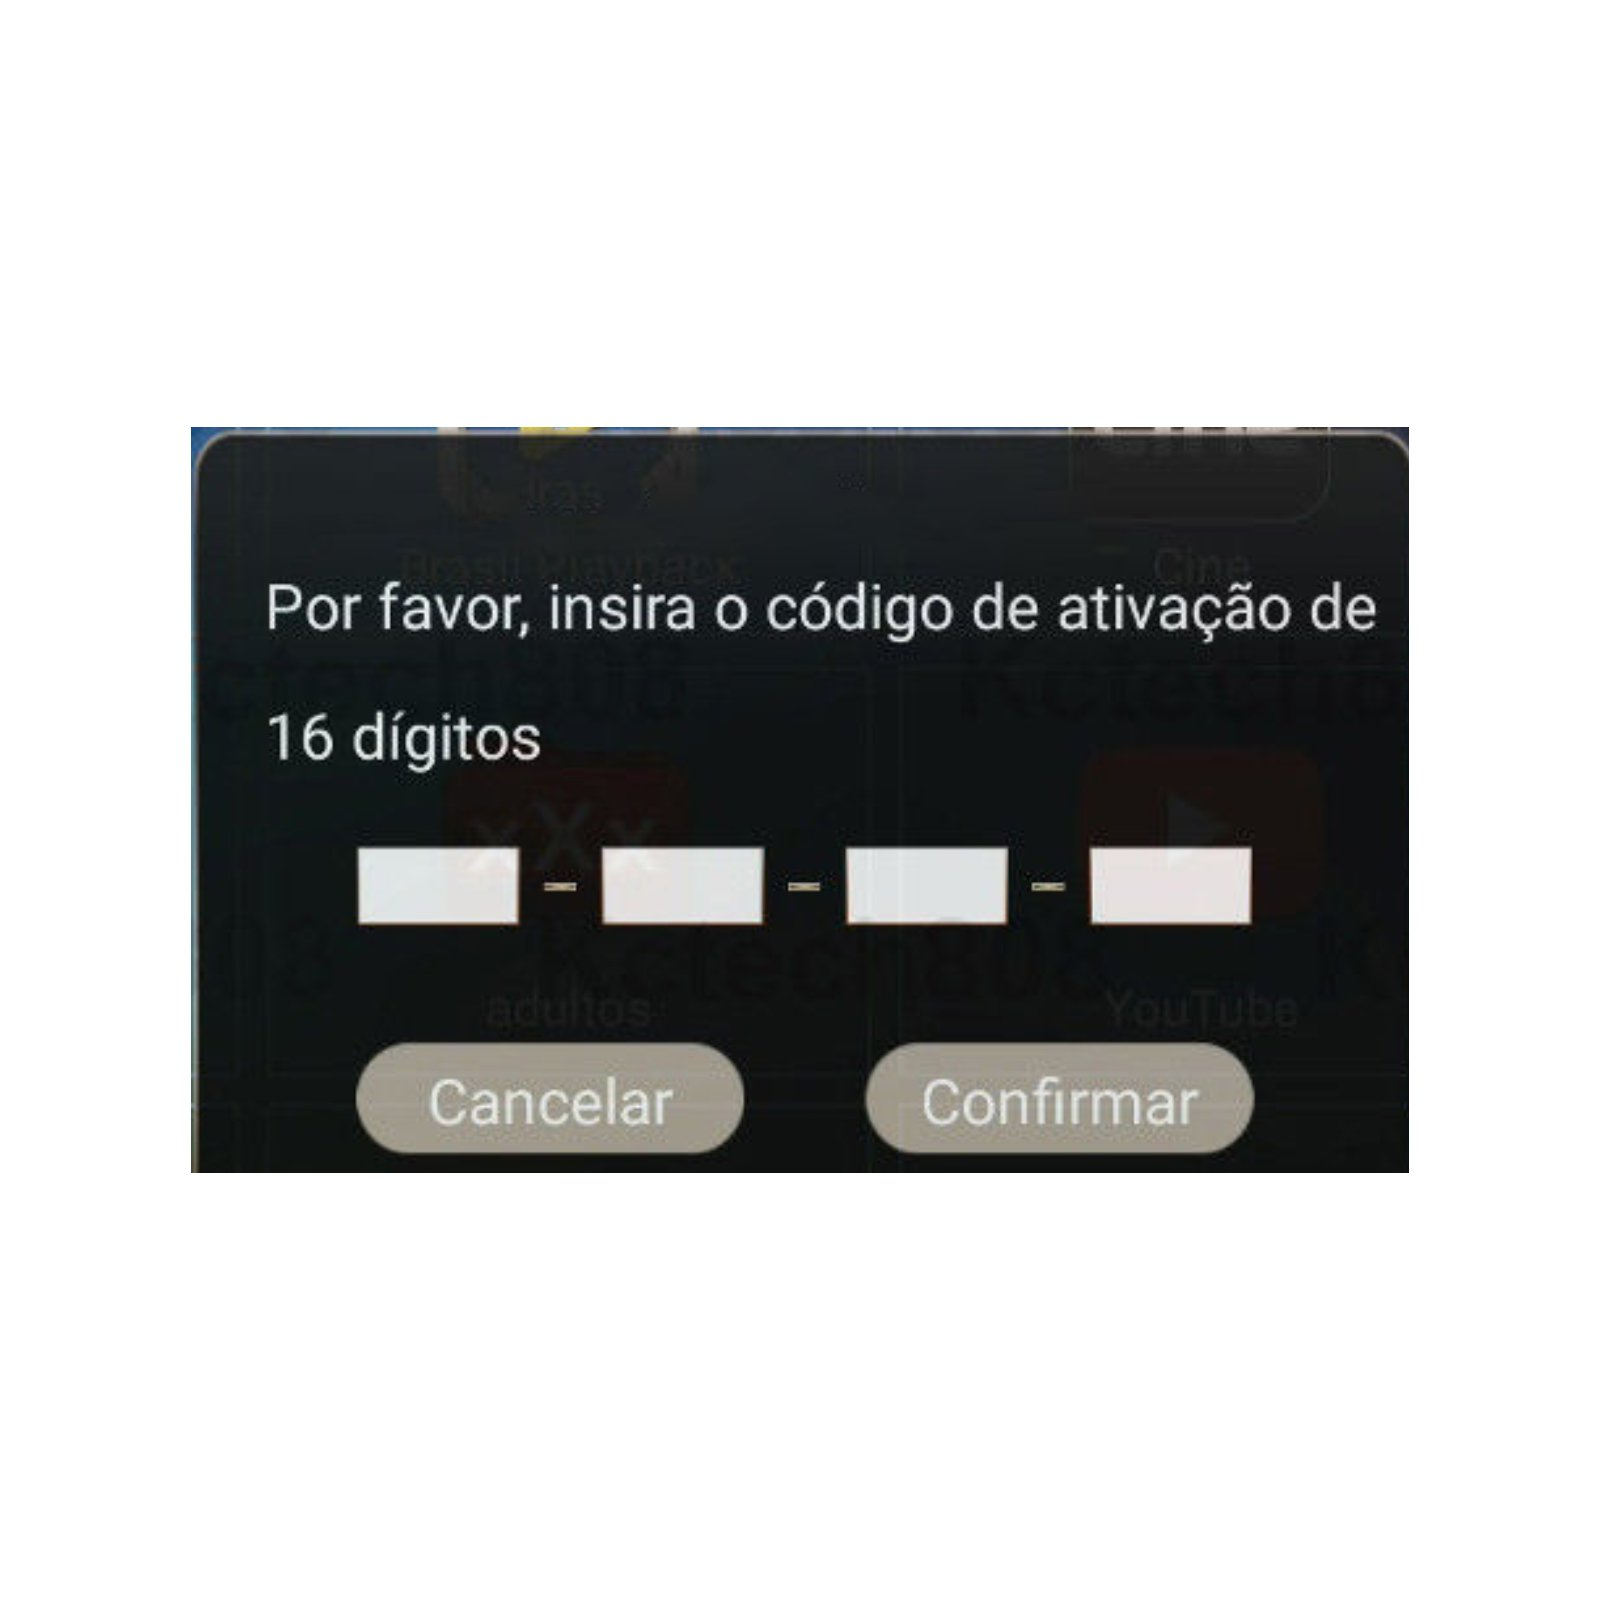 HTV, A1, A2, Brazil Box, Super Brazil IPTV Brazil Subscriptions 1 Code